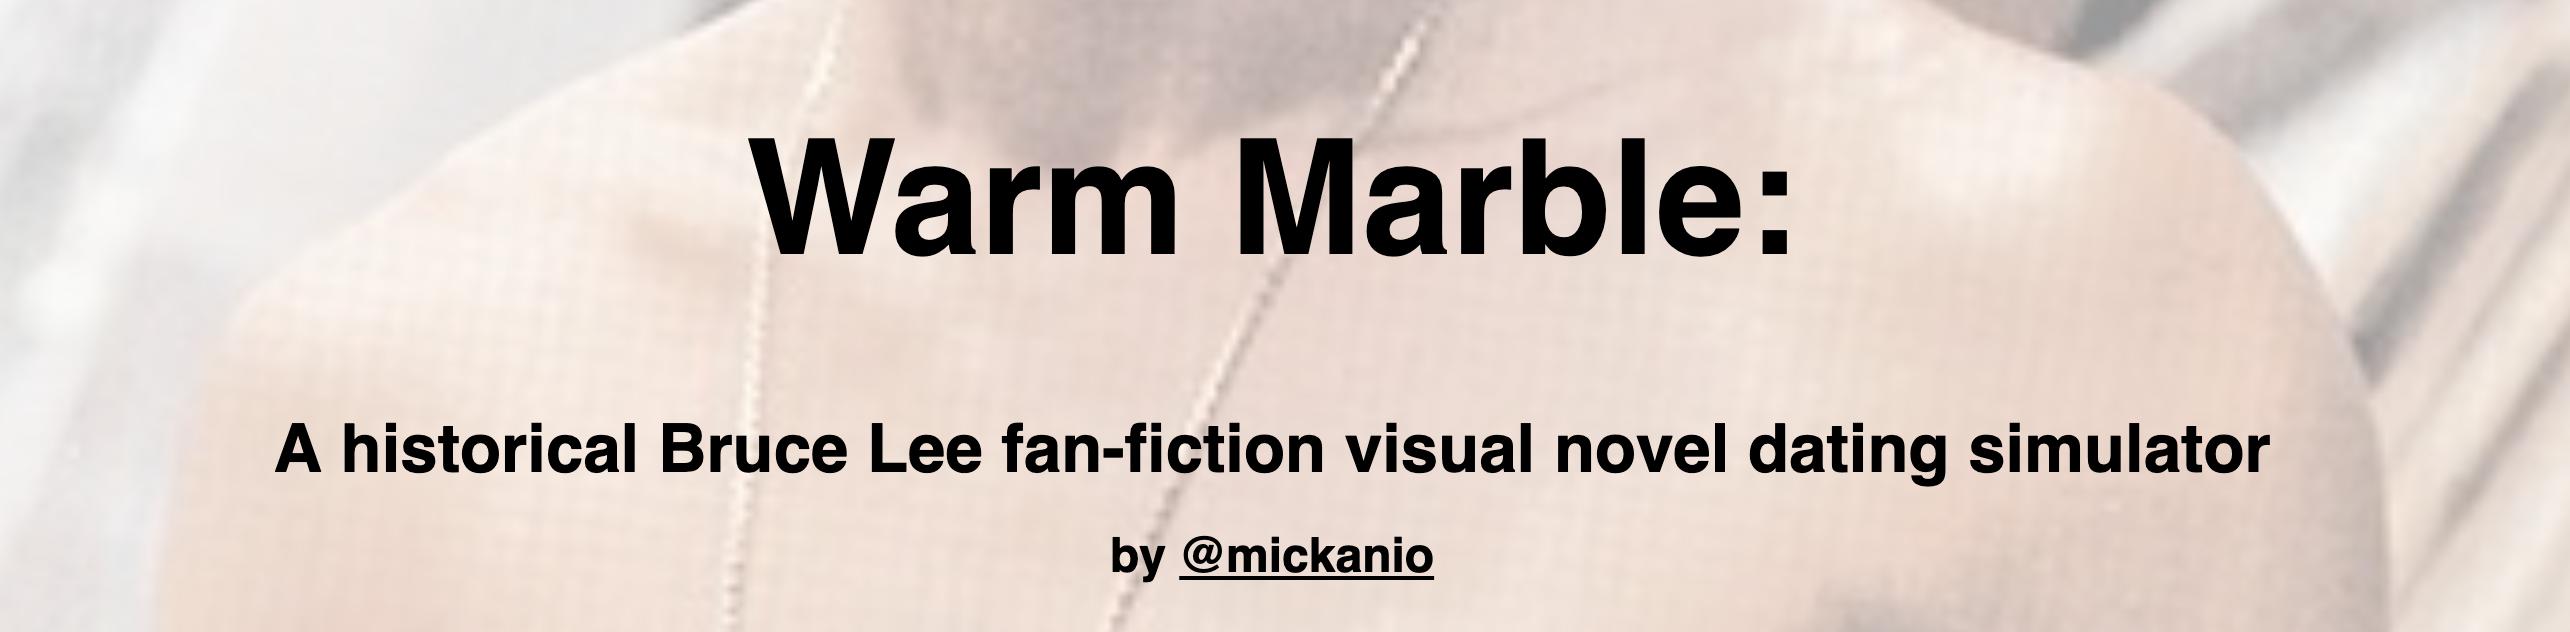 Warm Marble